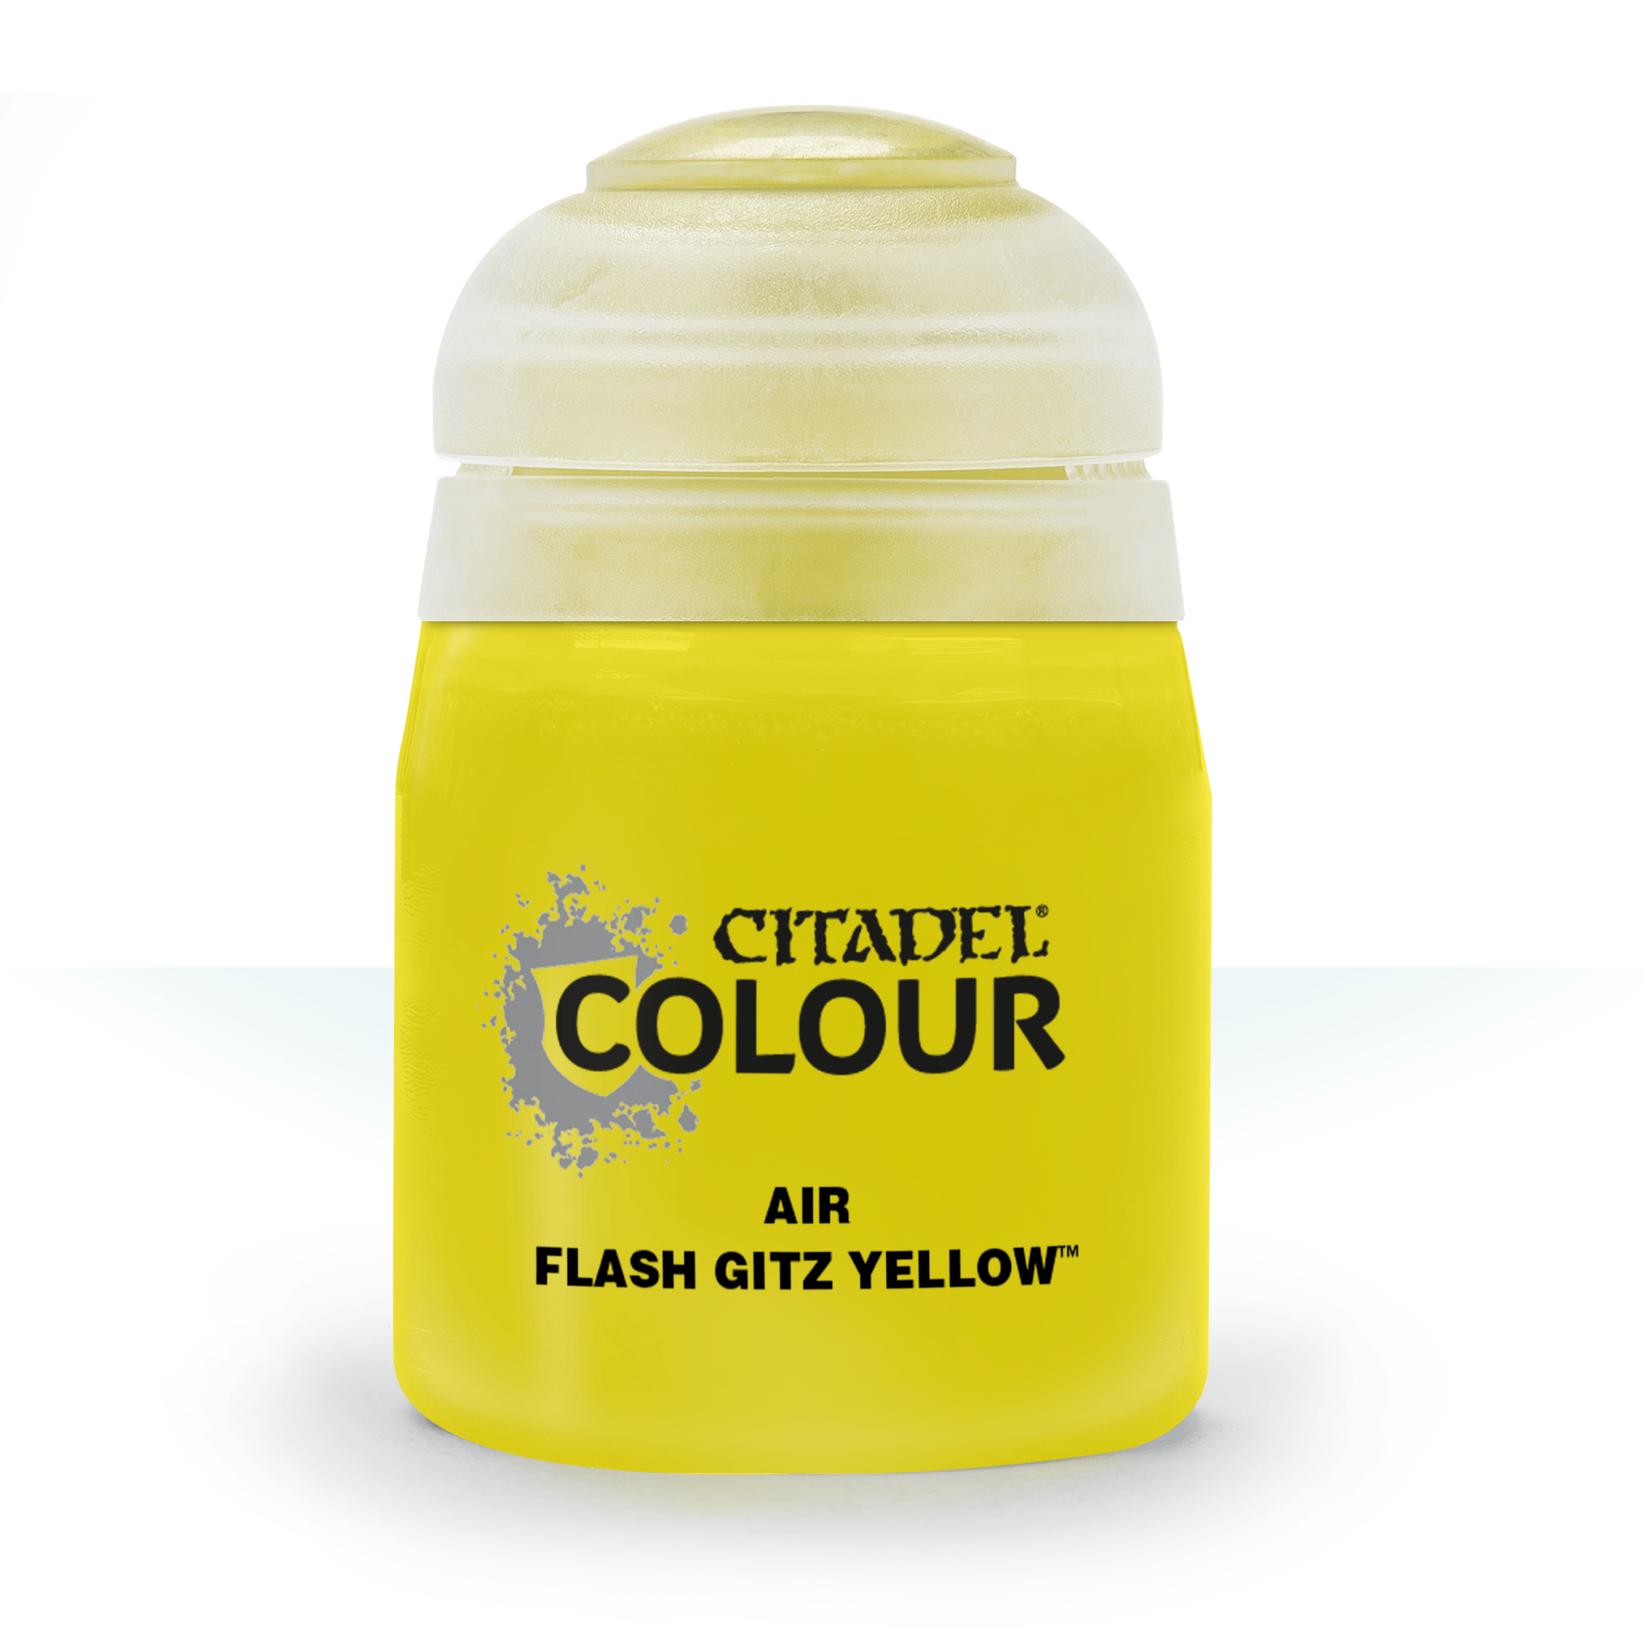 Games Workshop Flash Gitz Yellow (Air)